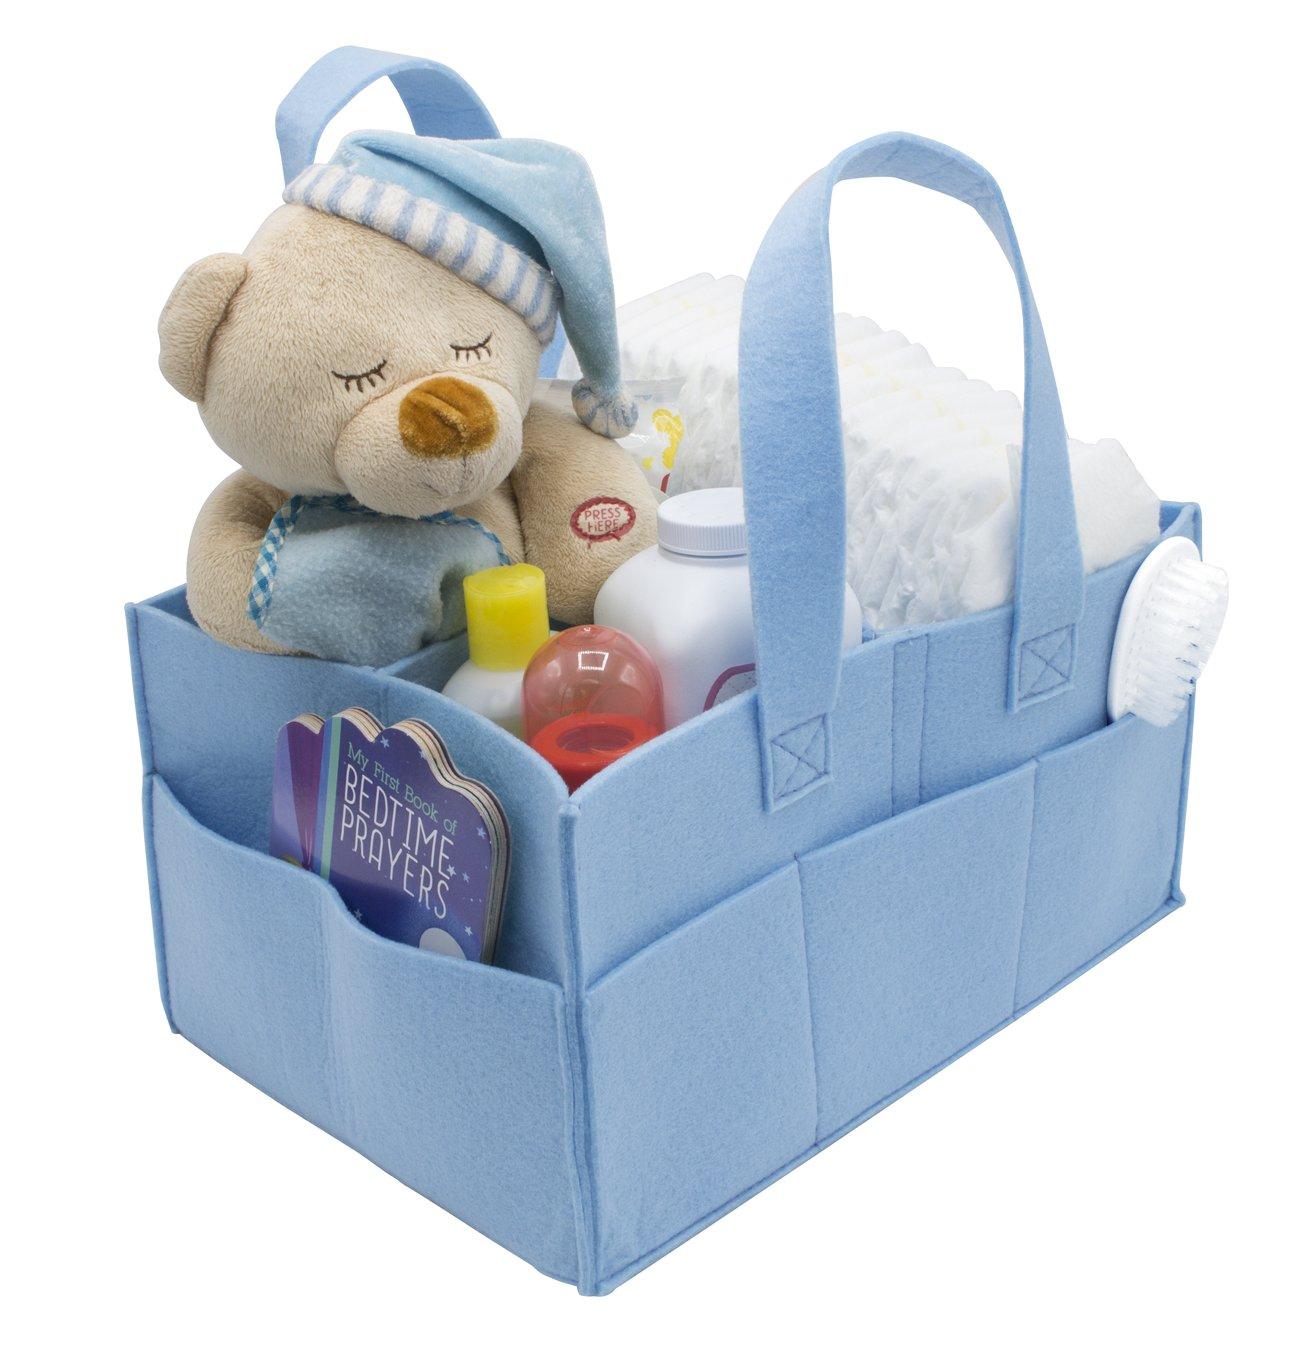 Amazon.com : Sorbus Felt Baby Organizer Diaper Caddy with Handle ...